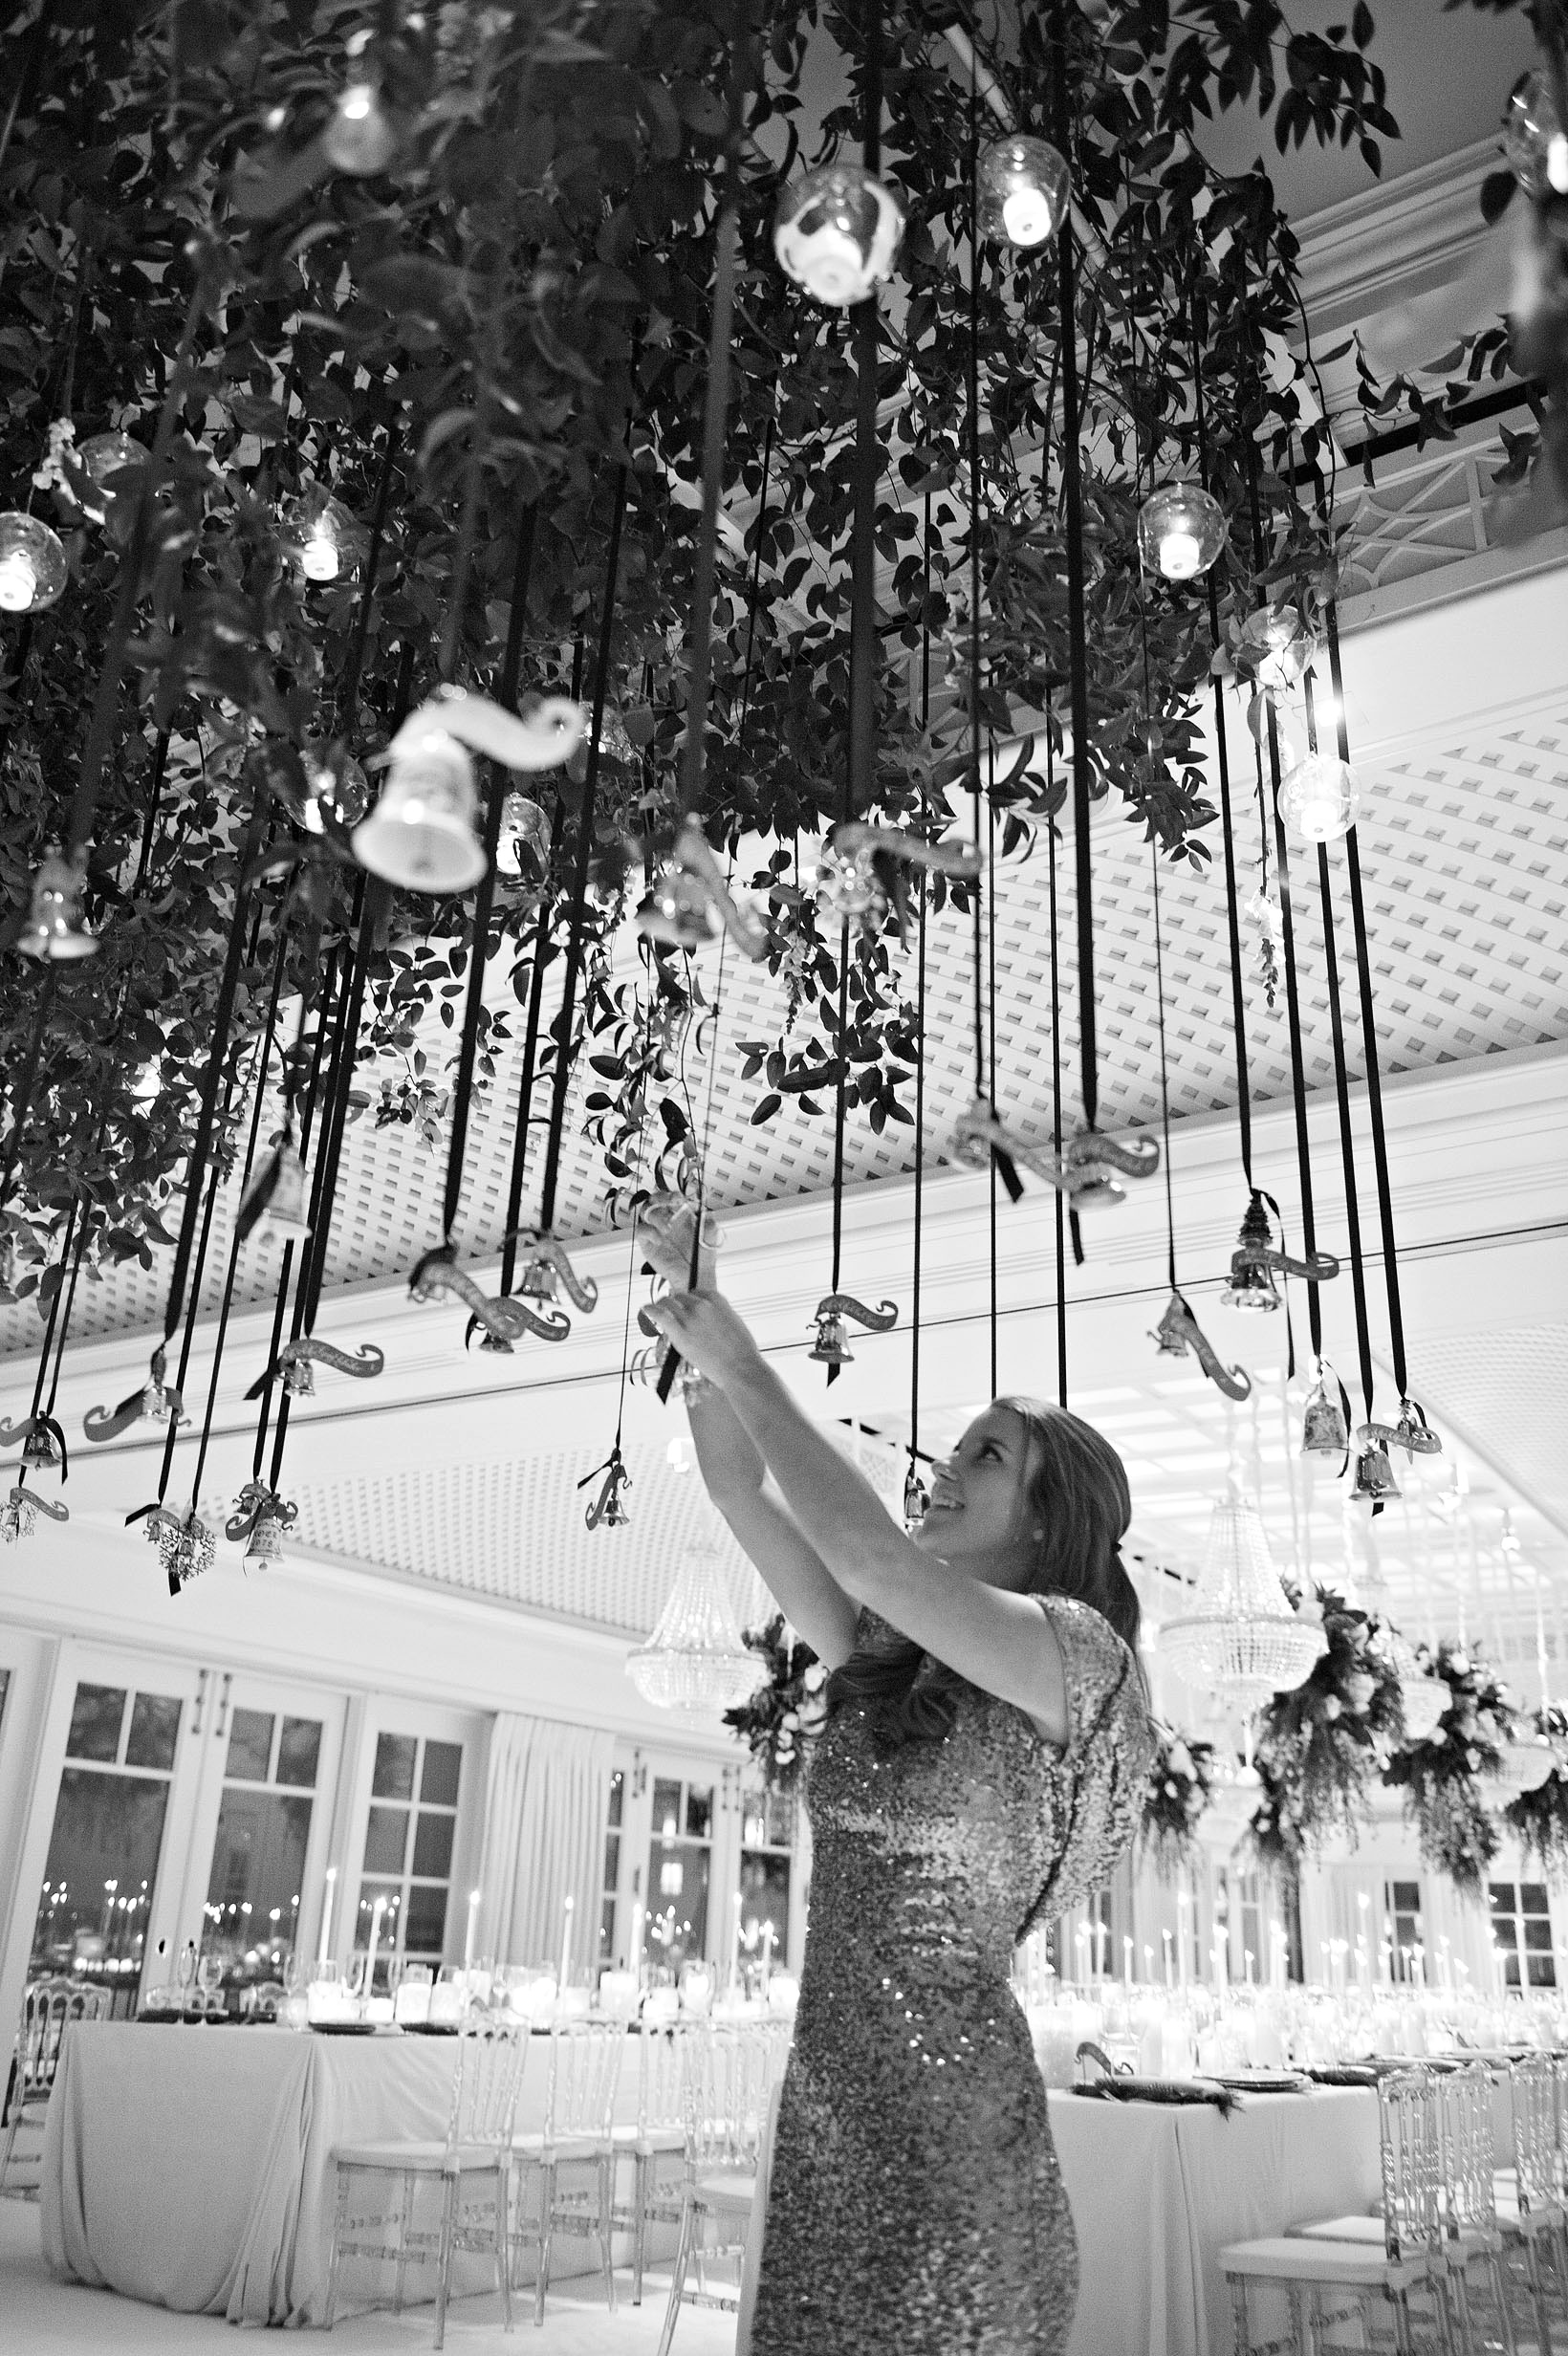 celina rob wedding virginia bells hanging